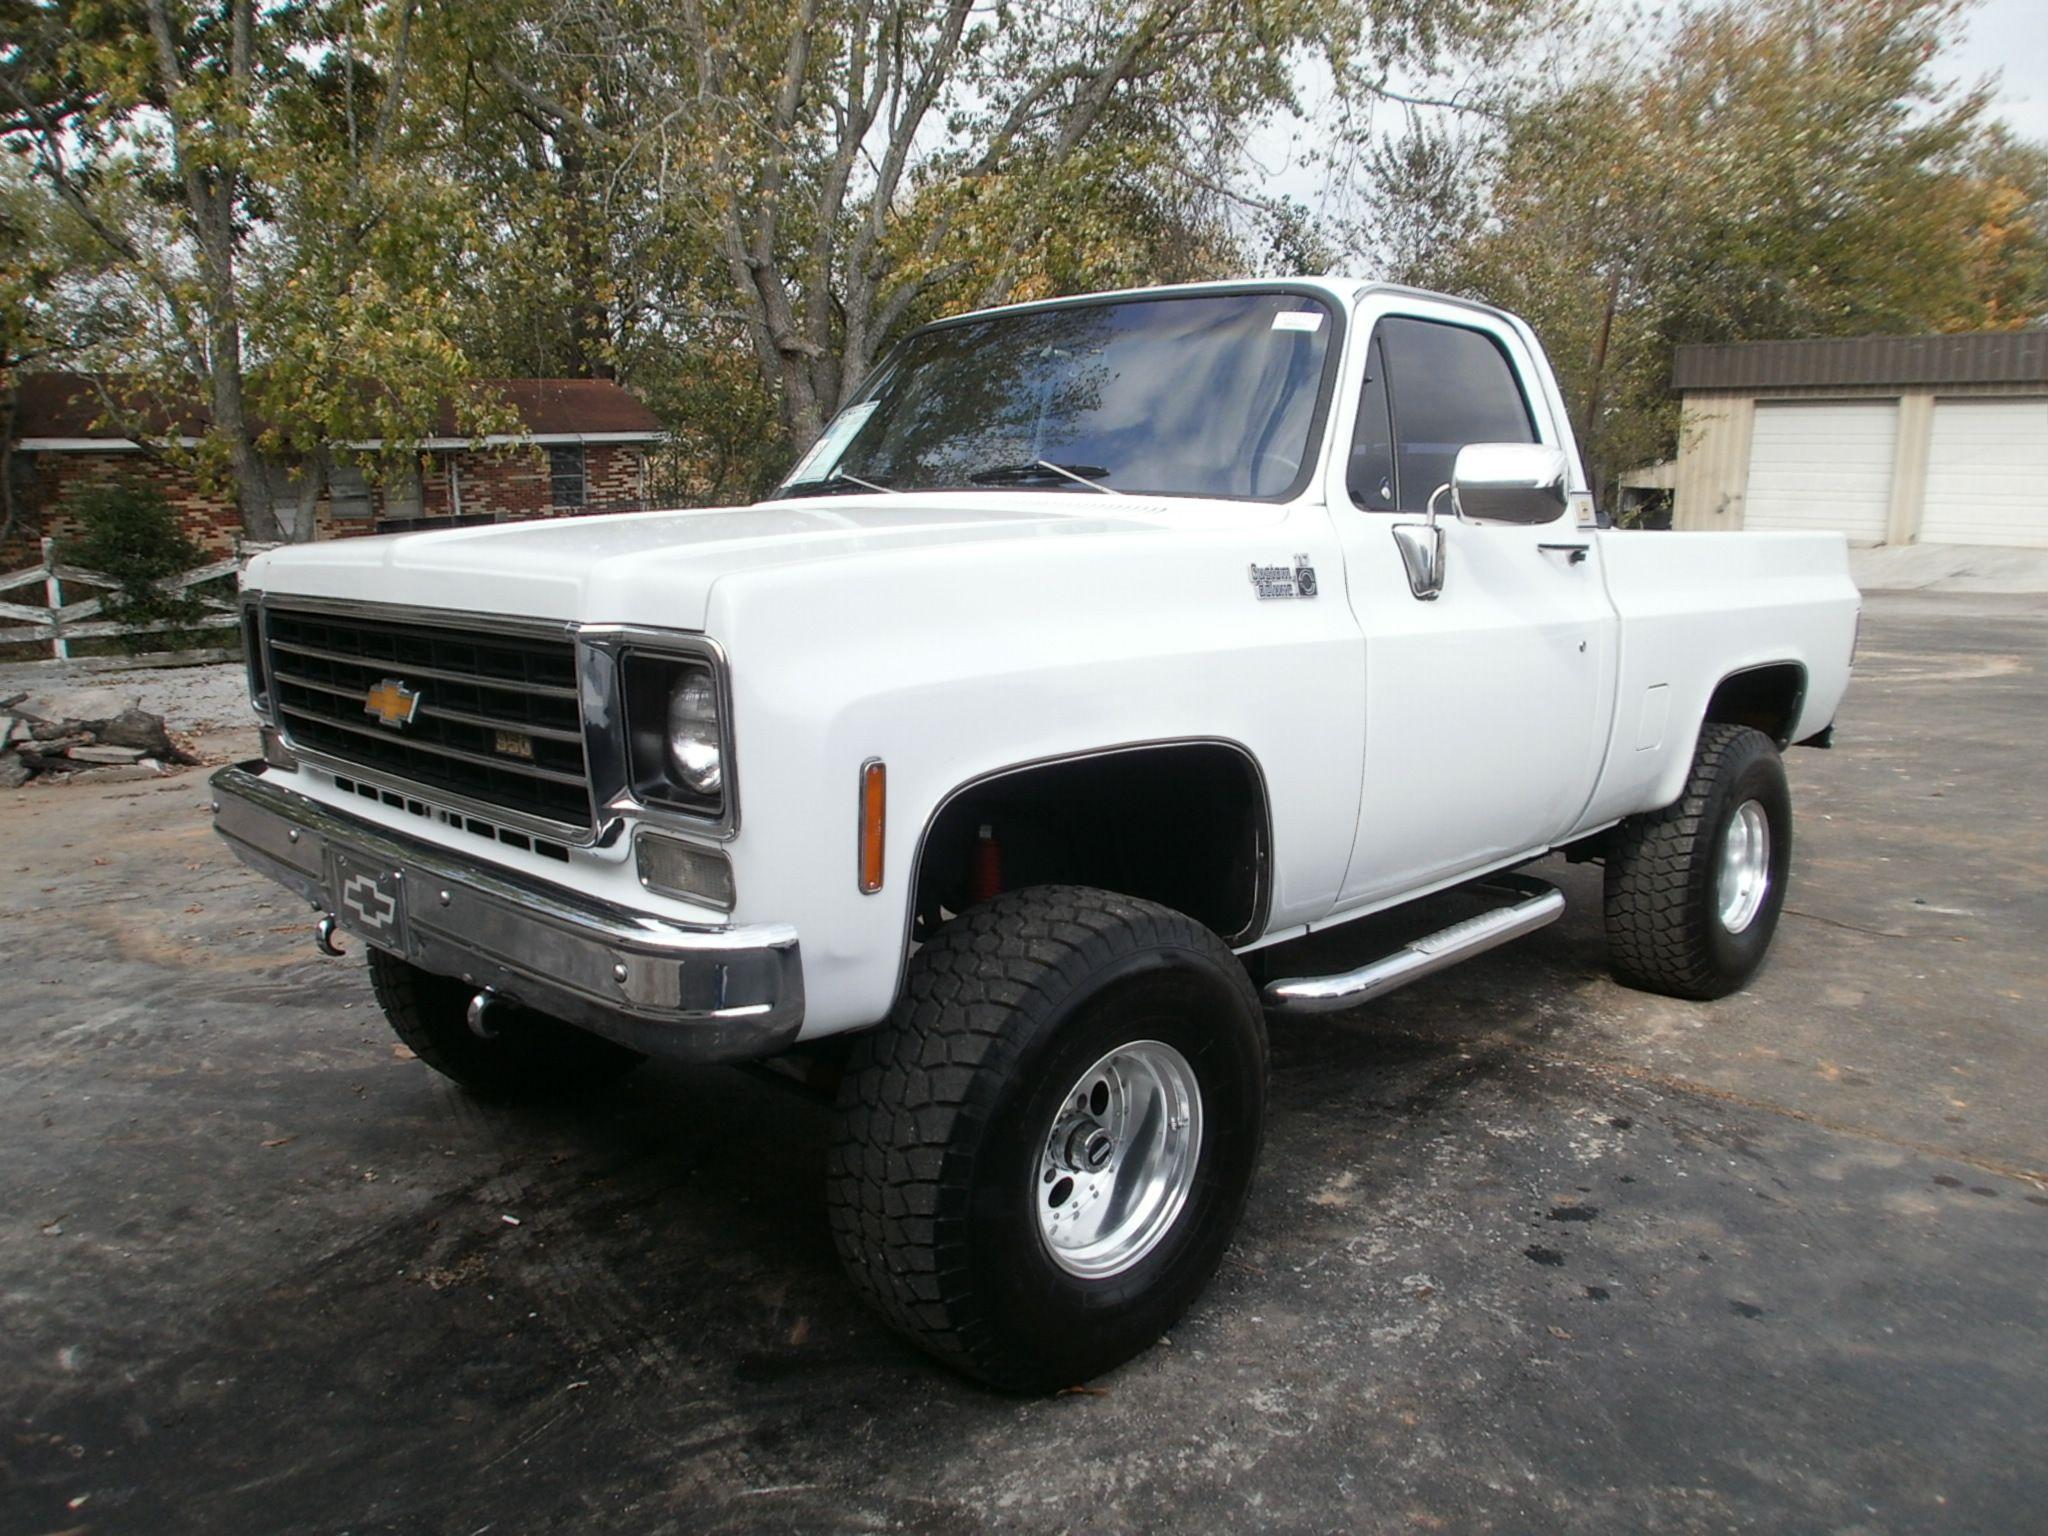 1977 c10 chevrolet truck 77 chevy c10